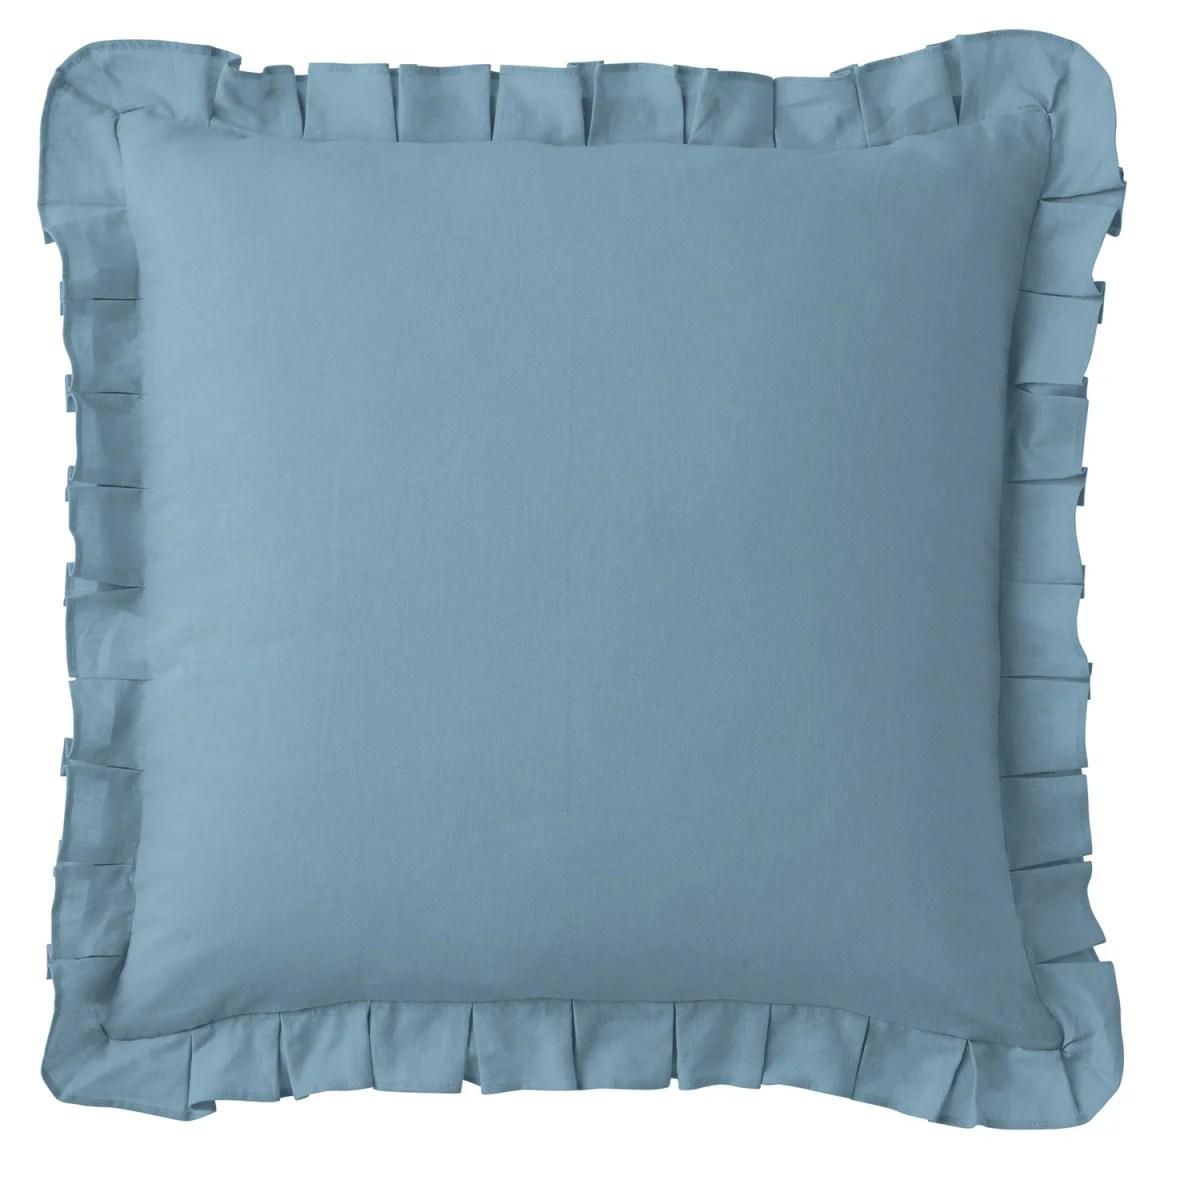 linen cotton 20 in square pillow cover blue smoke